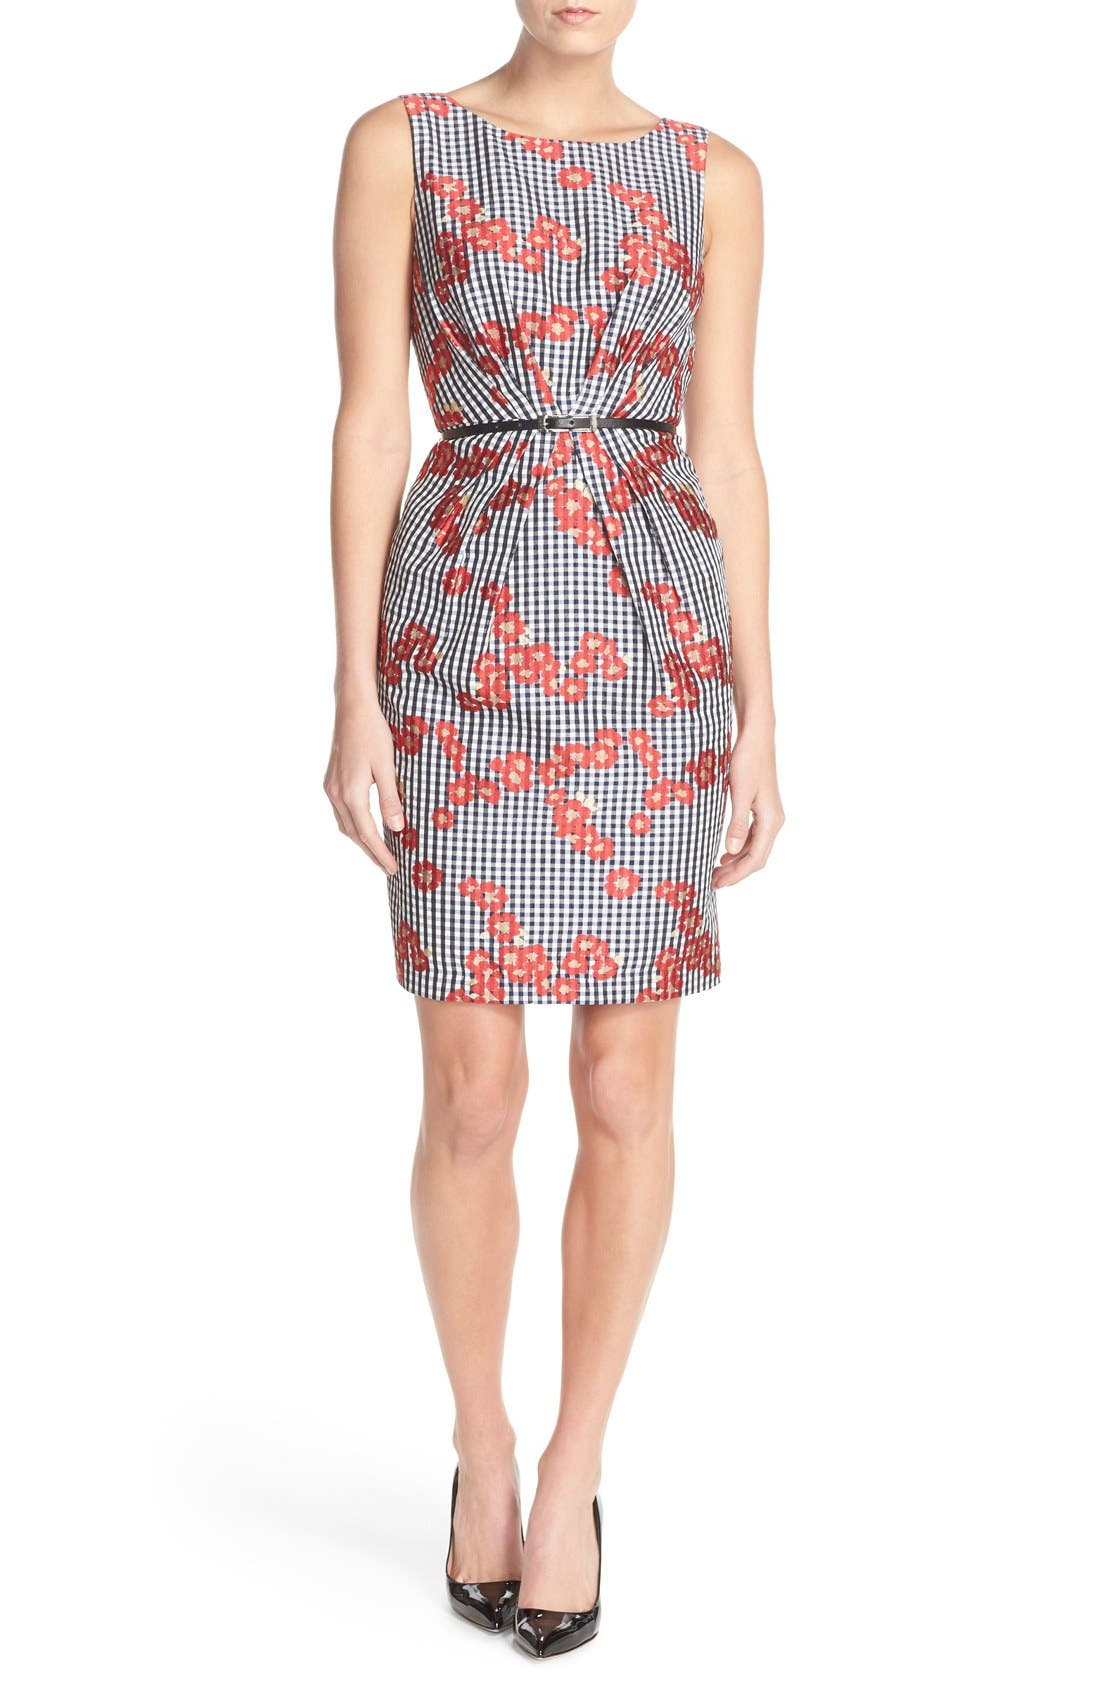 Alternate Image 1 Selected - Adrianna Papell Floral & Gingham Jacquard Sheath Dress (Regular & Petite)